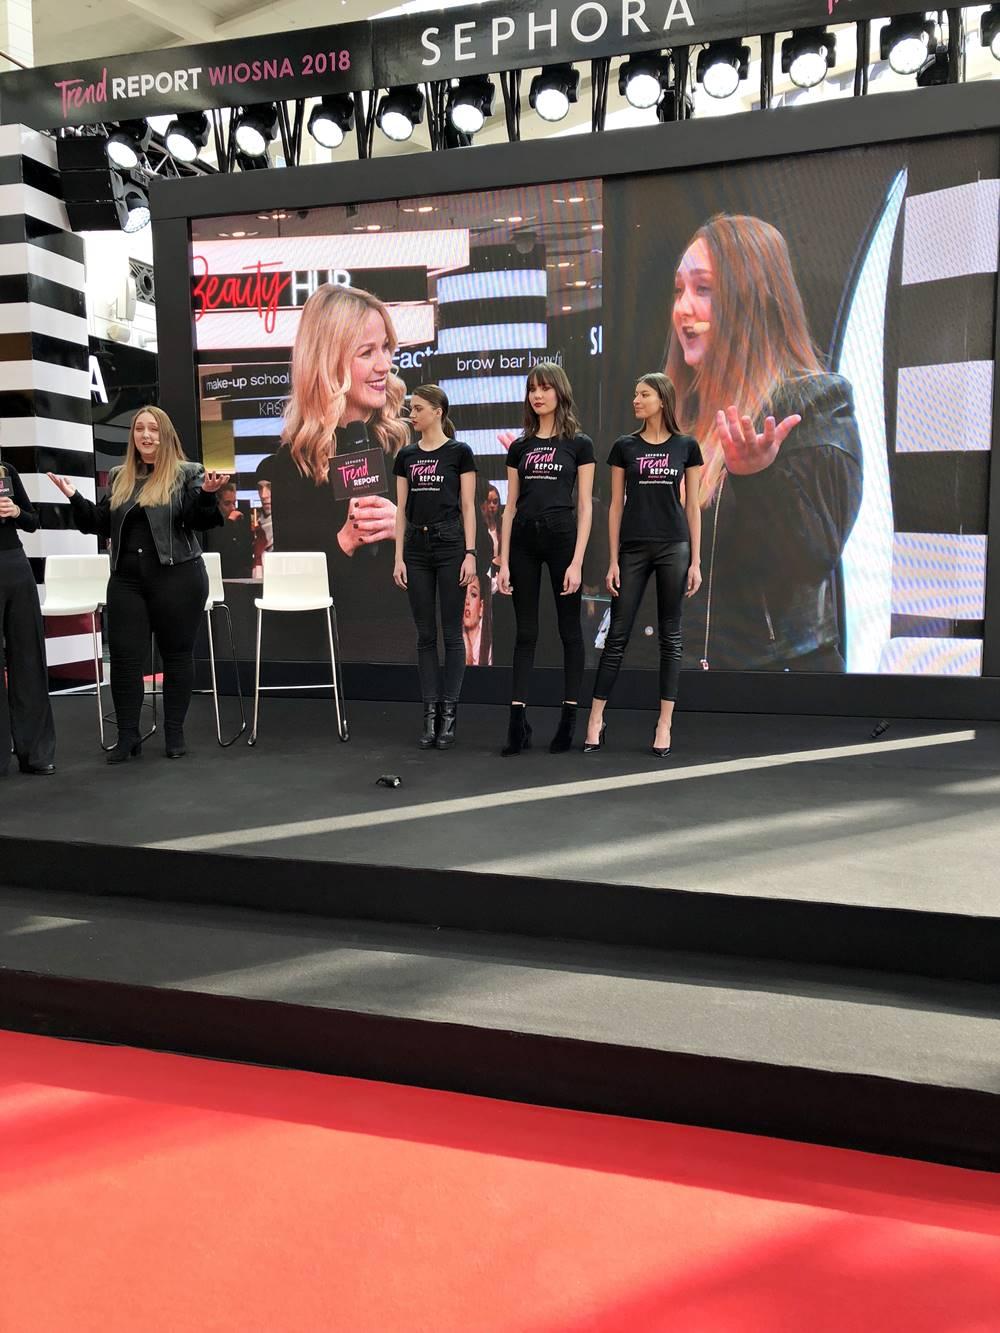 sephora trend report 2018